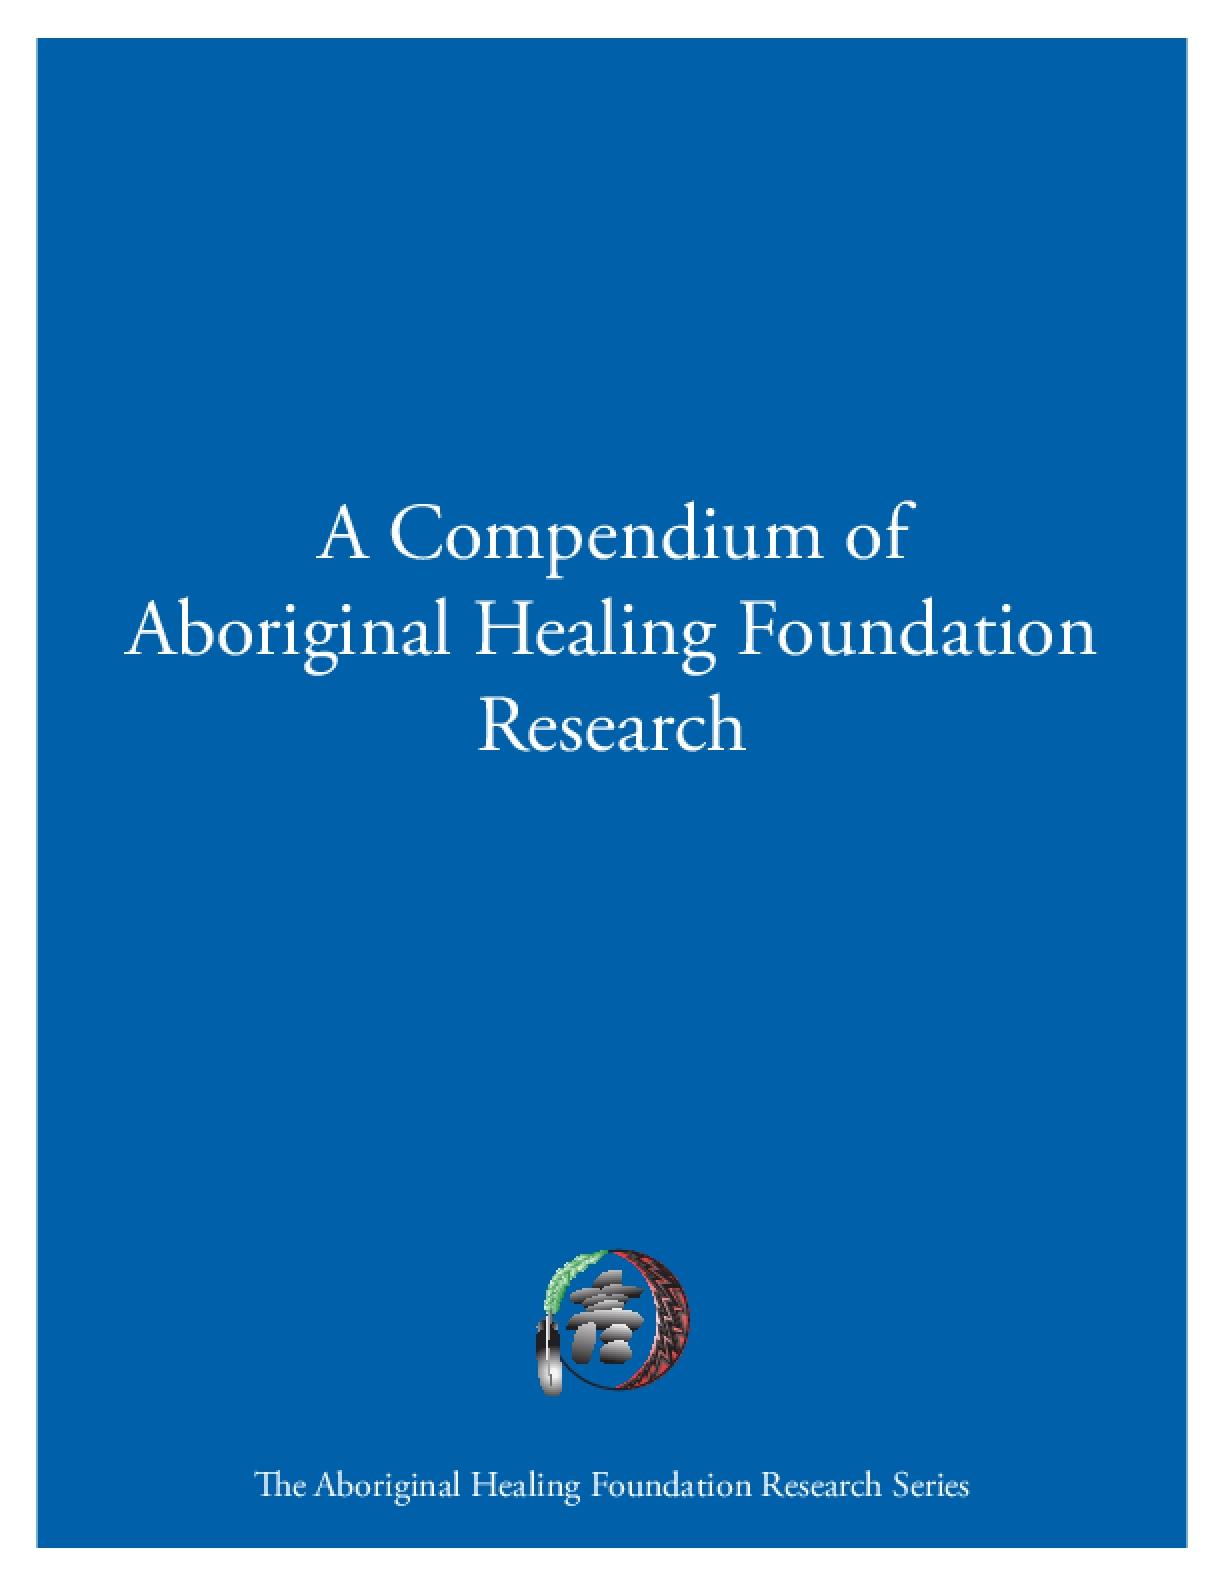 A Compendium of Aboriginal Healing Foundation Research